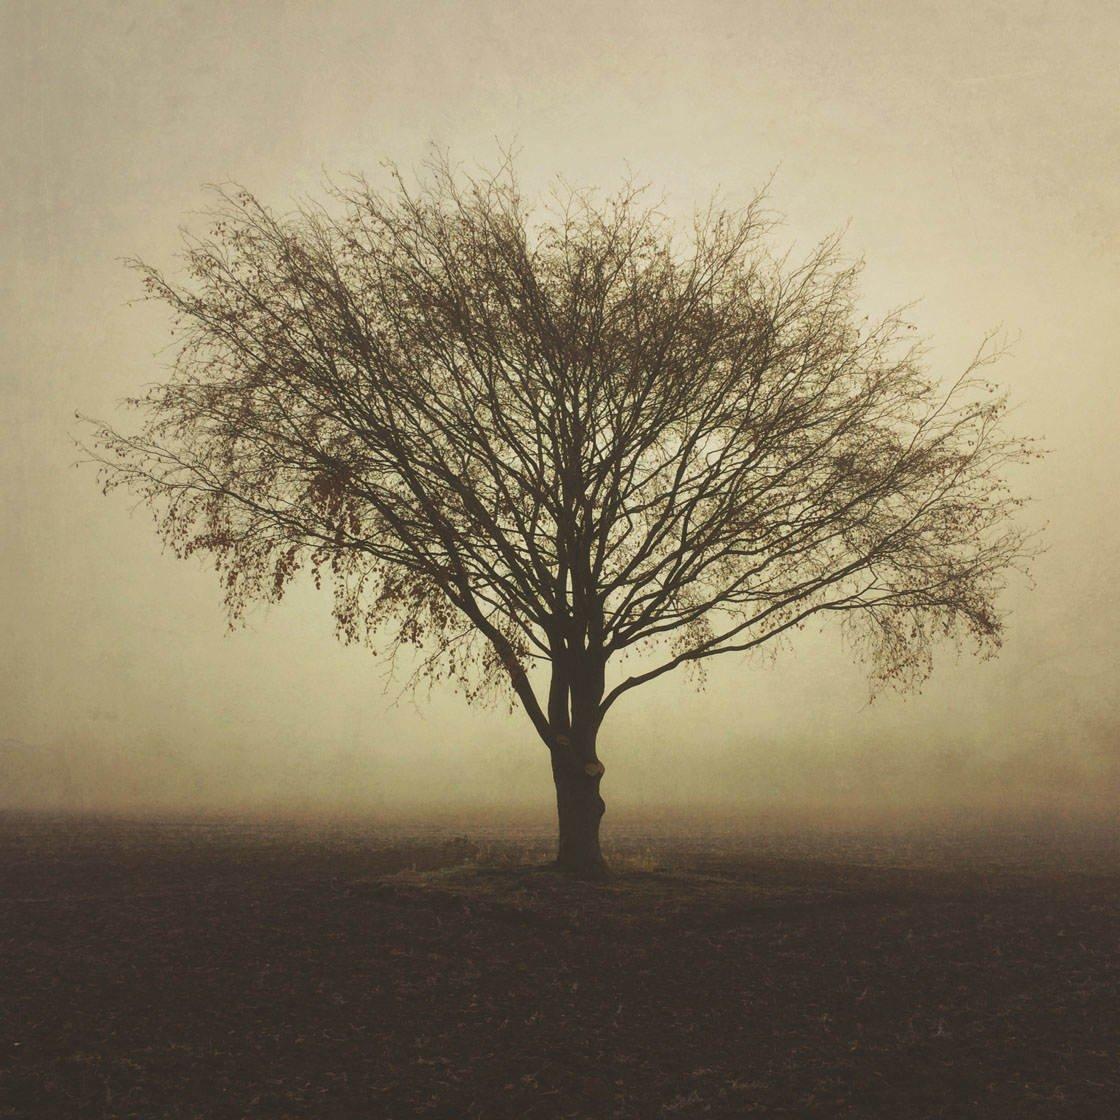 Fog & Mist iPhone Photos 36 no script